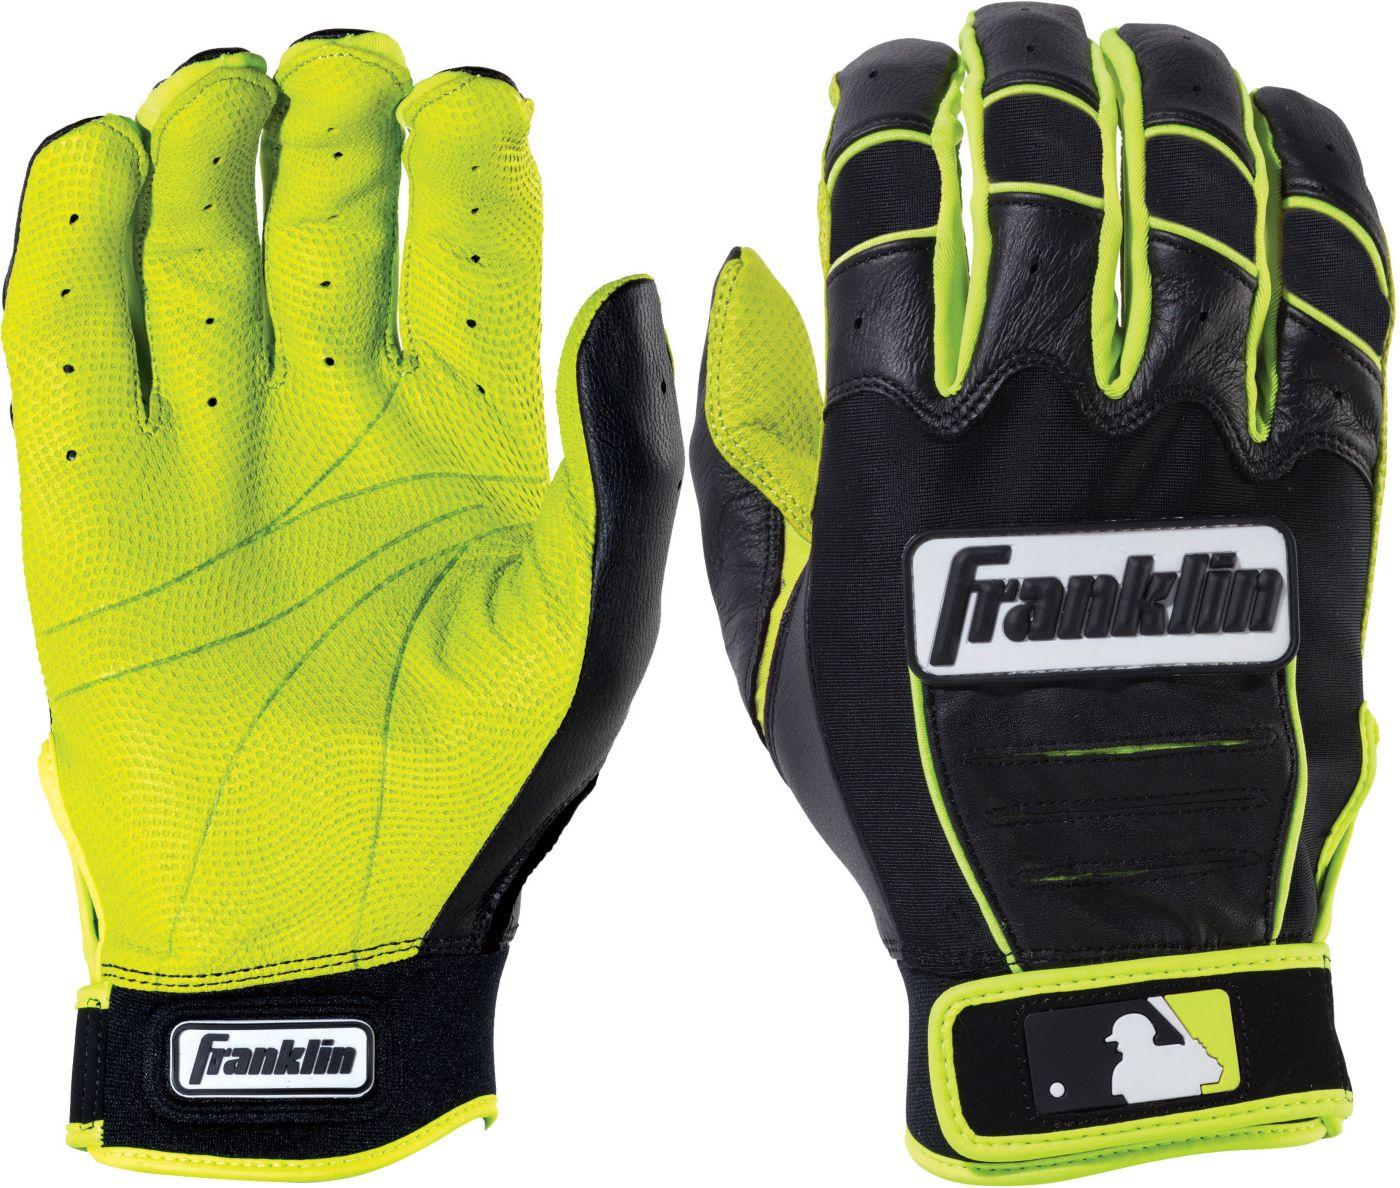 Franklin Youth CFX Pro Revolt Series Batting Gloves